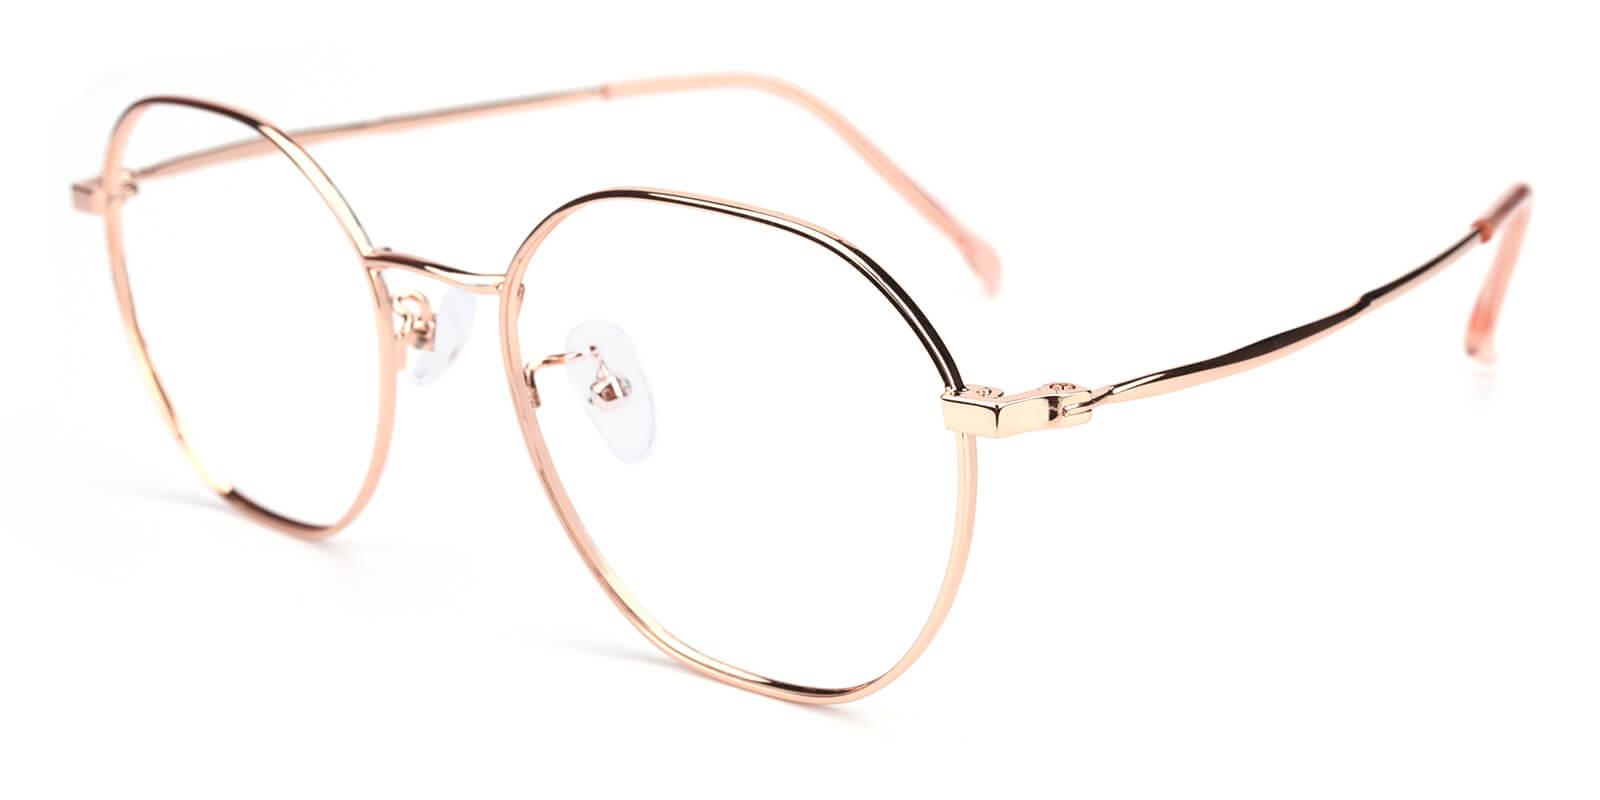 Govind-Pink-Round-Metal-Eyeglasses-detail